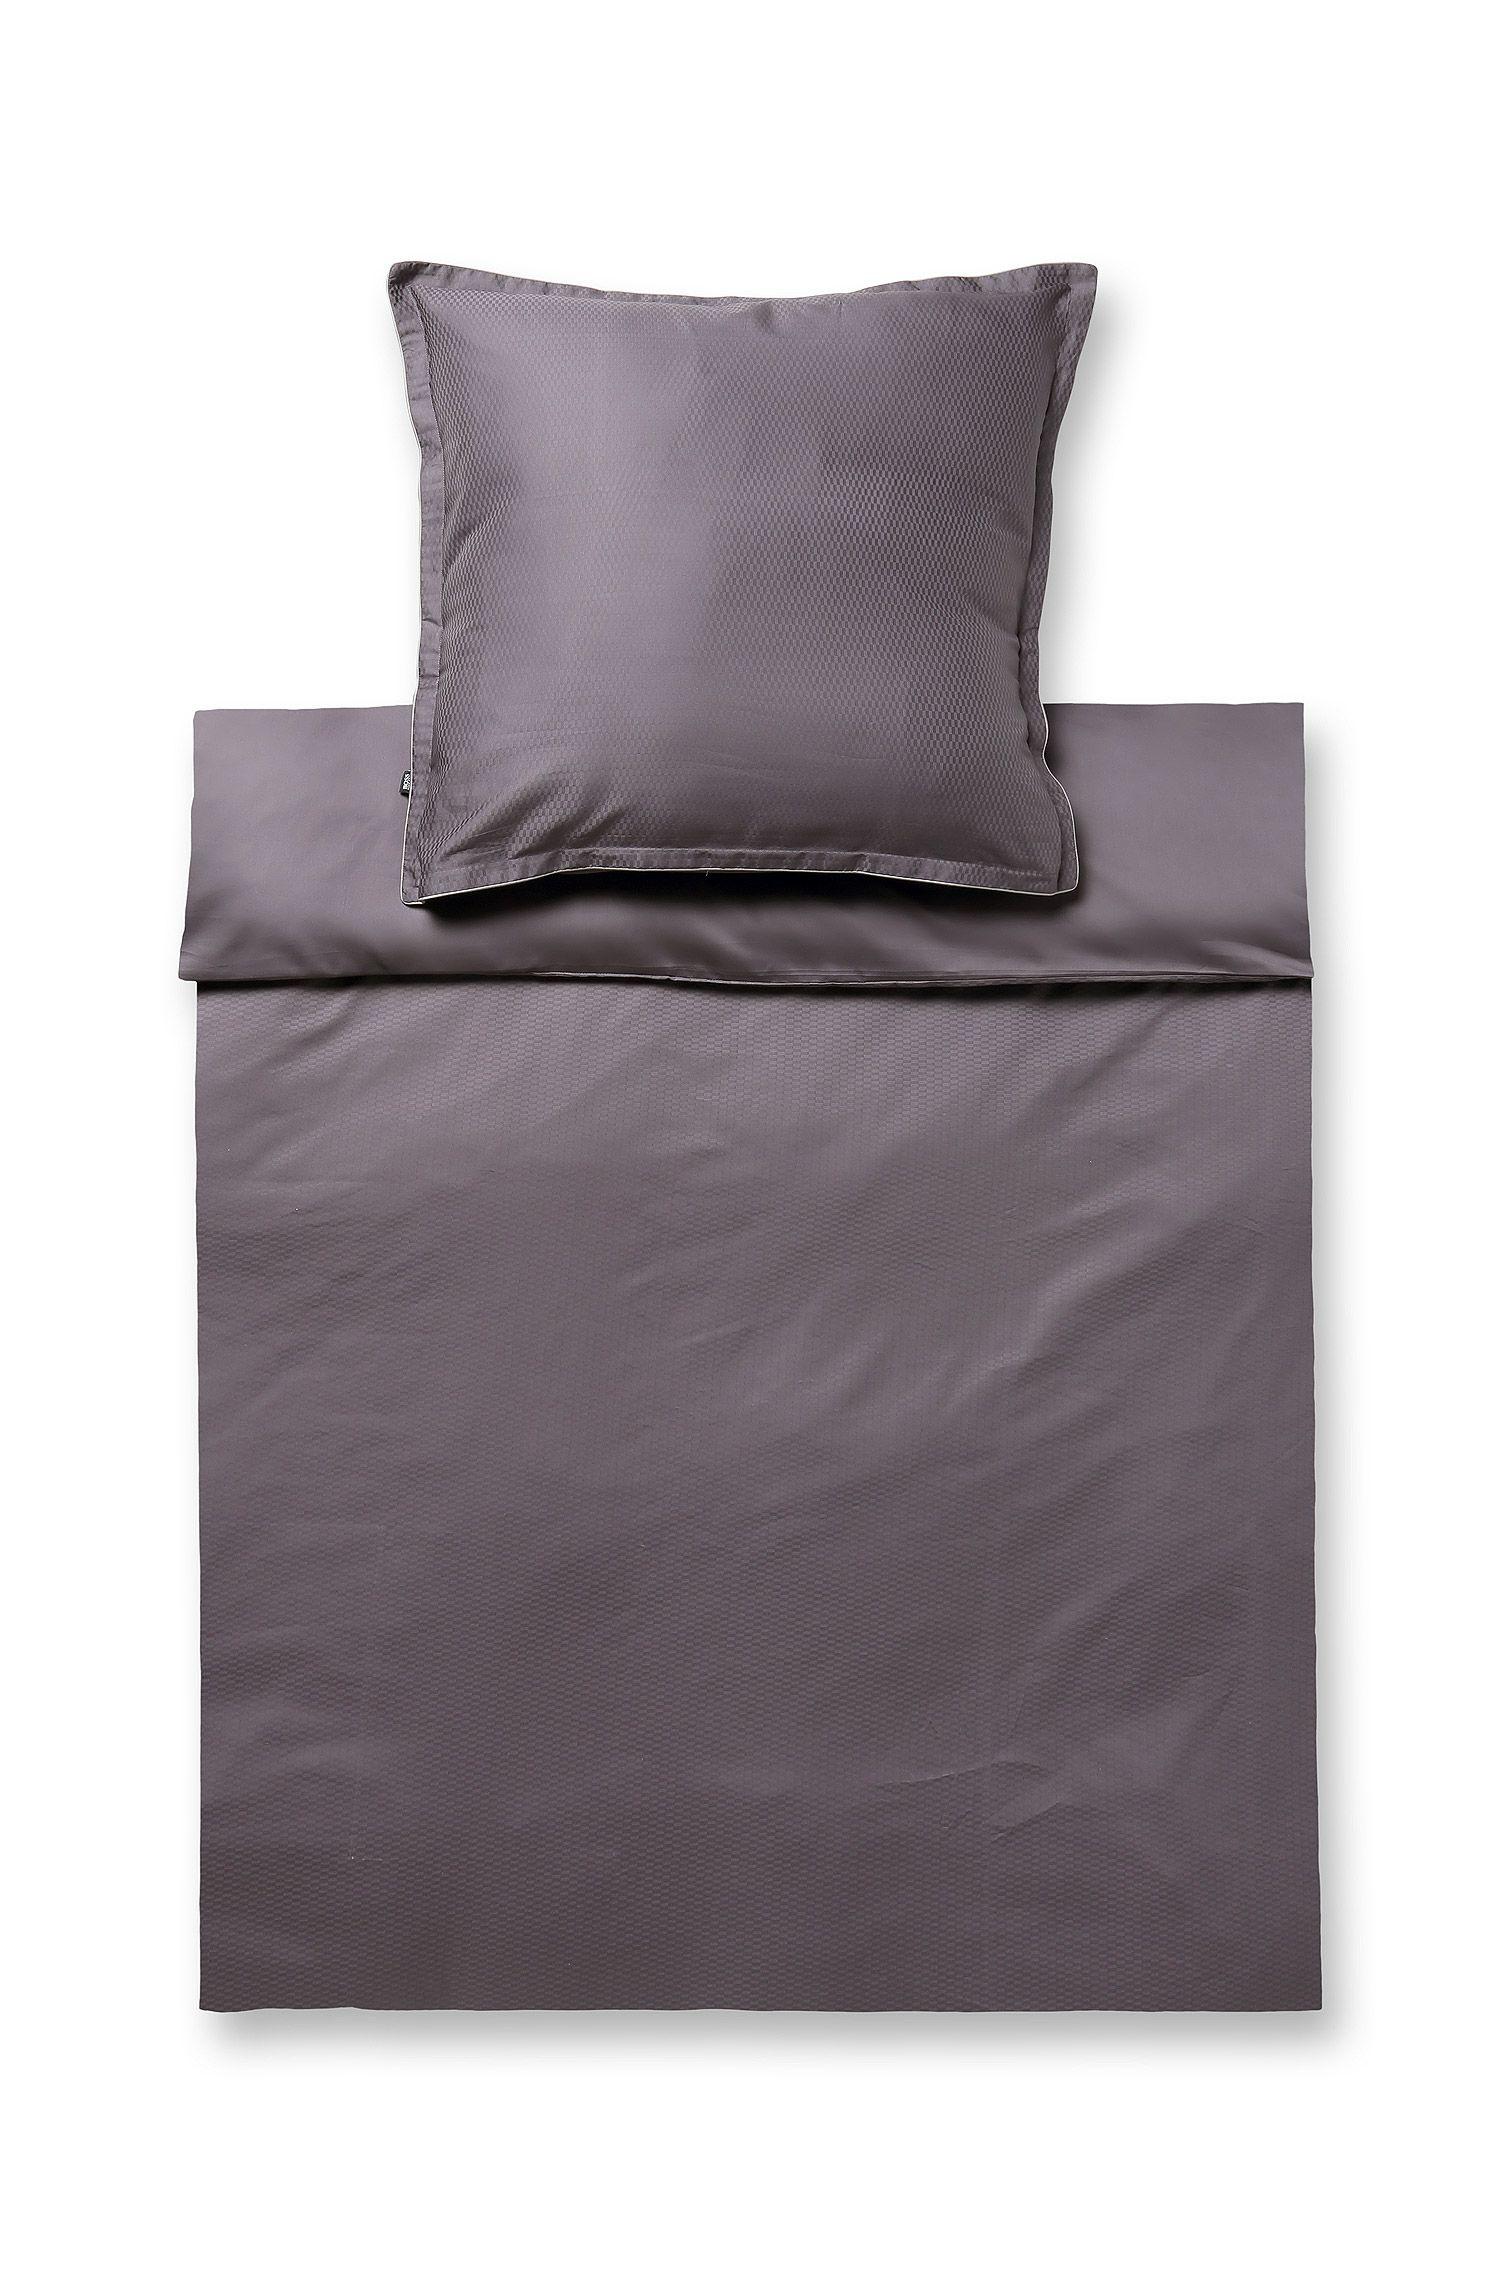 Bettdeckenbezug ´LOFT` aus Baumwollsatin